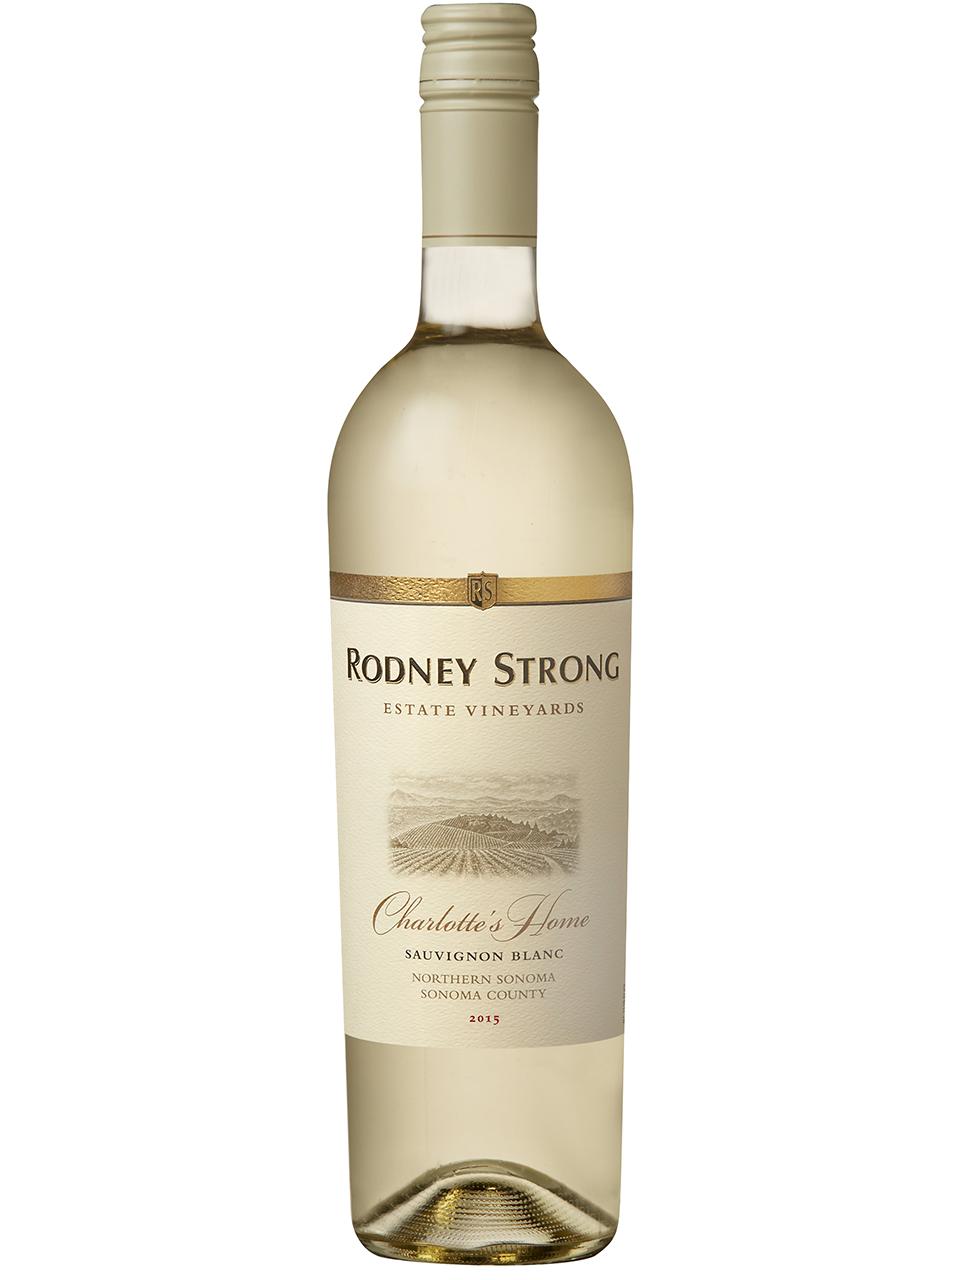 Rodney Strong Charlottes Home Sauvignon Blanc